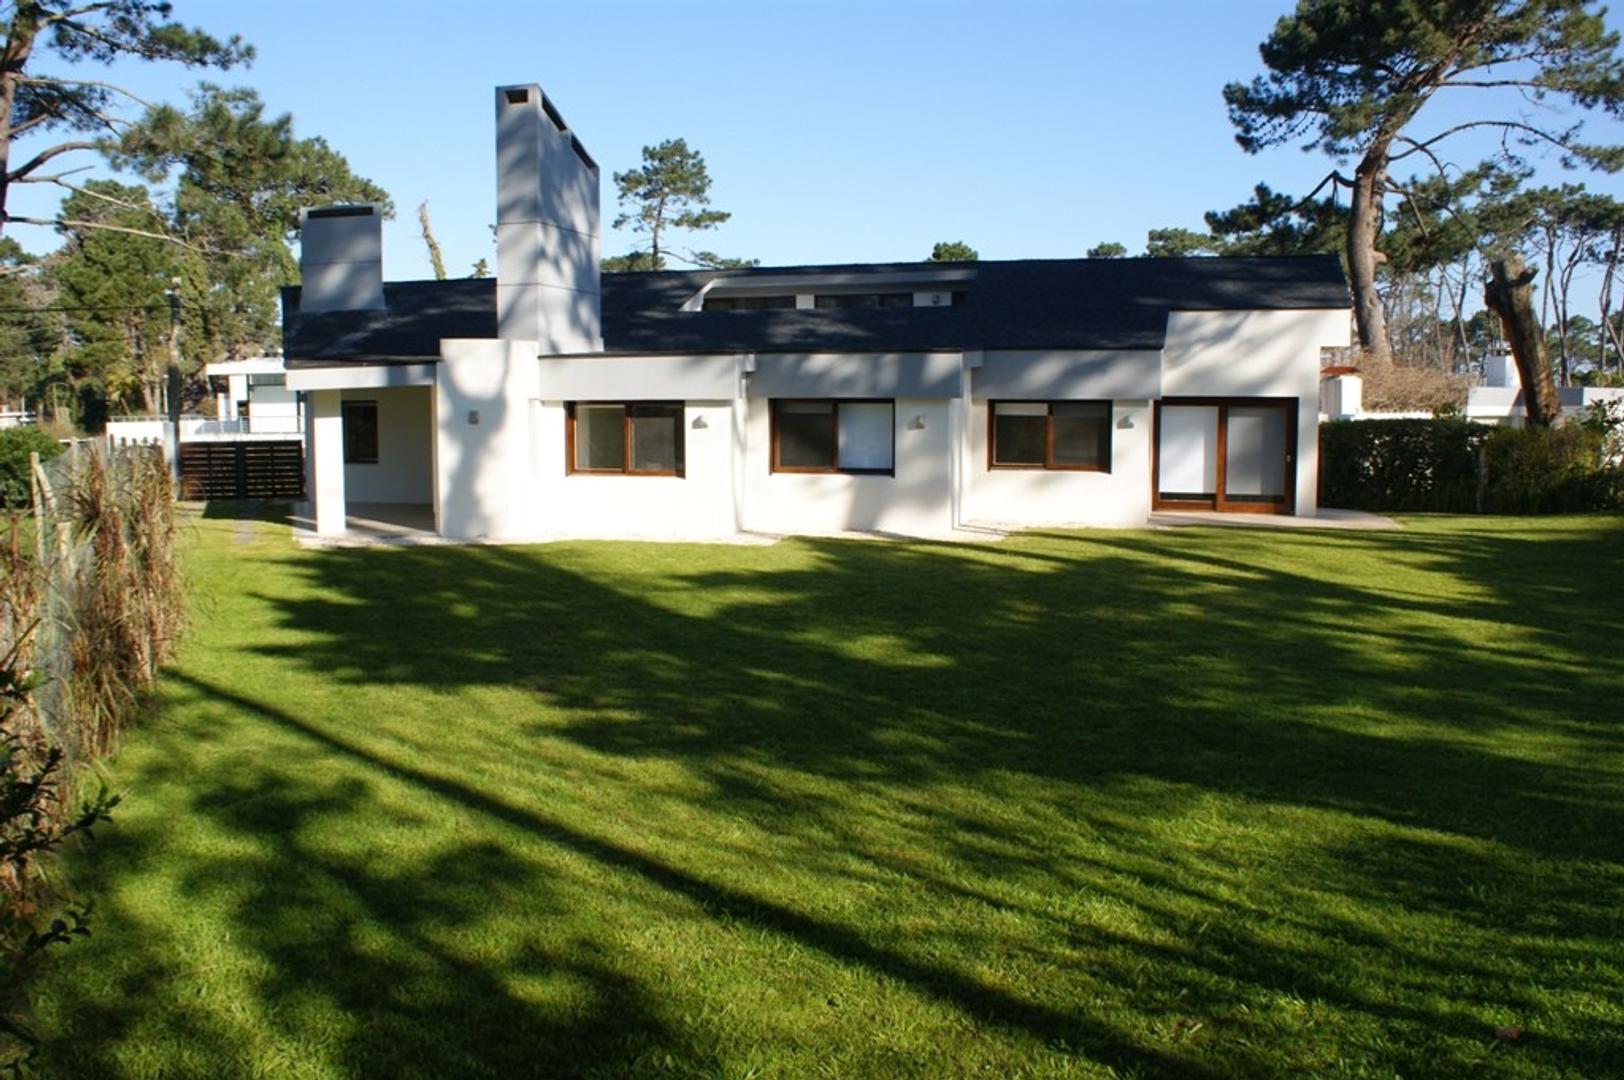 (ISM-ISM-253) Casa - Venta - Uruguay, Punta del Este - Foto 17